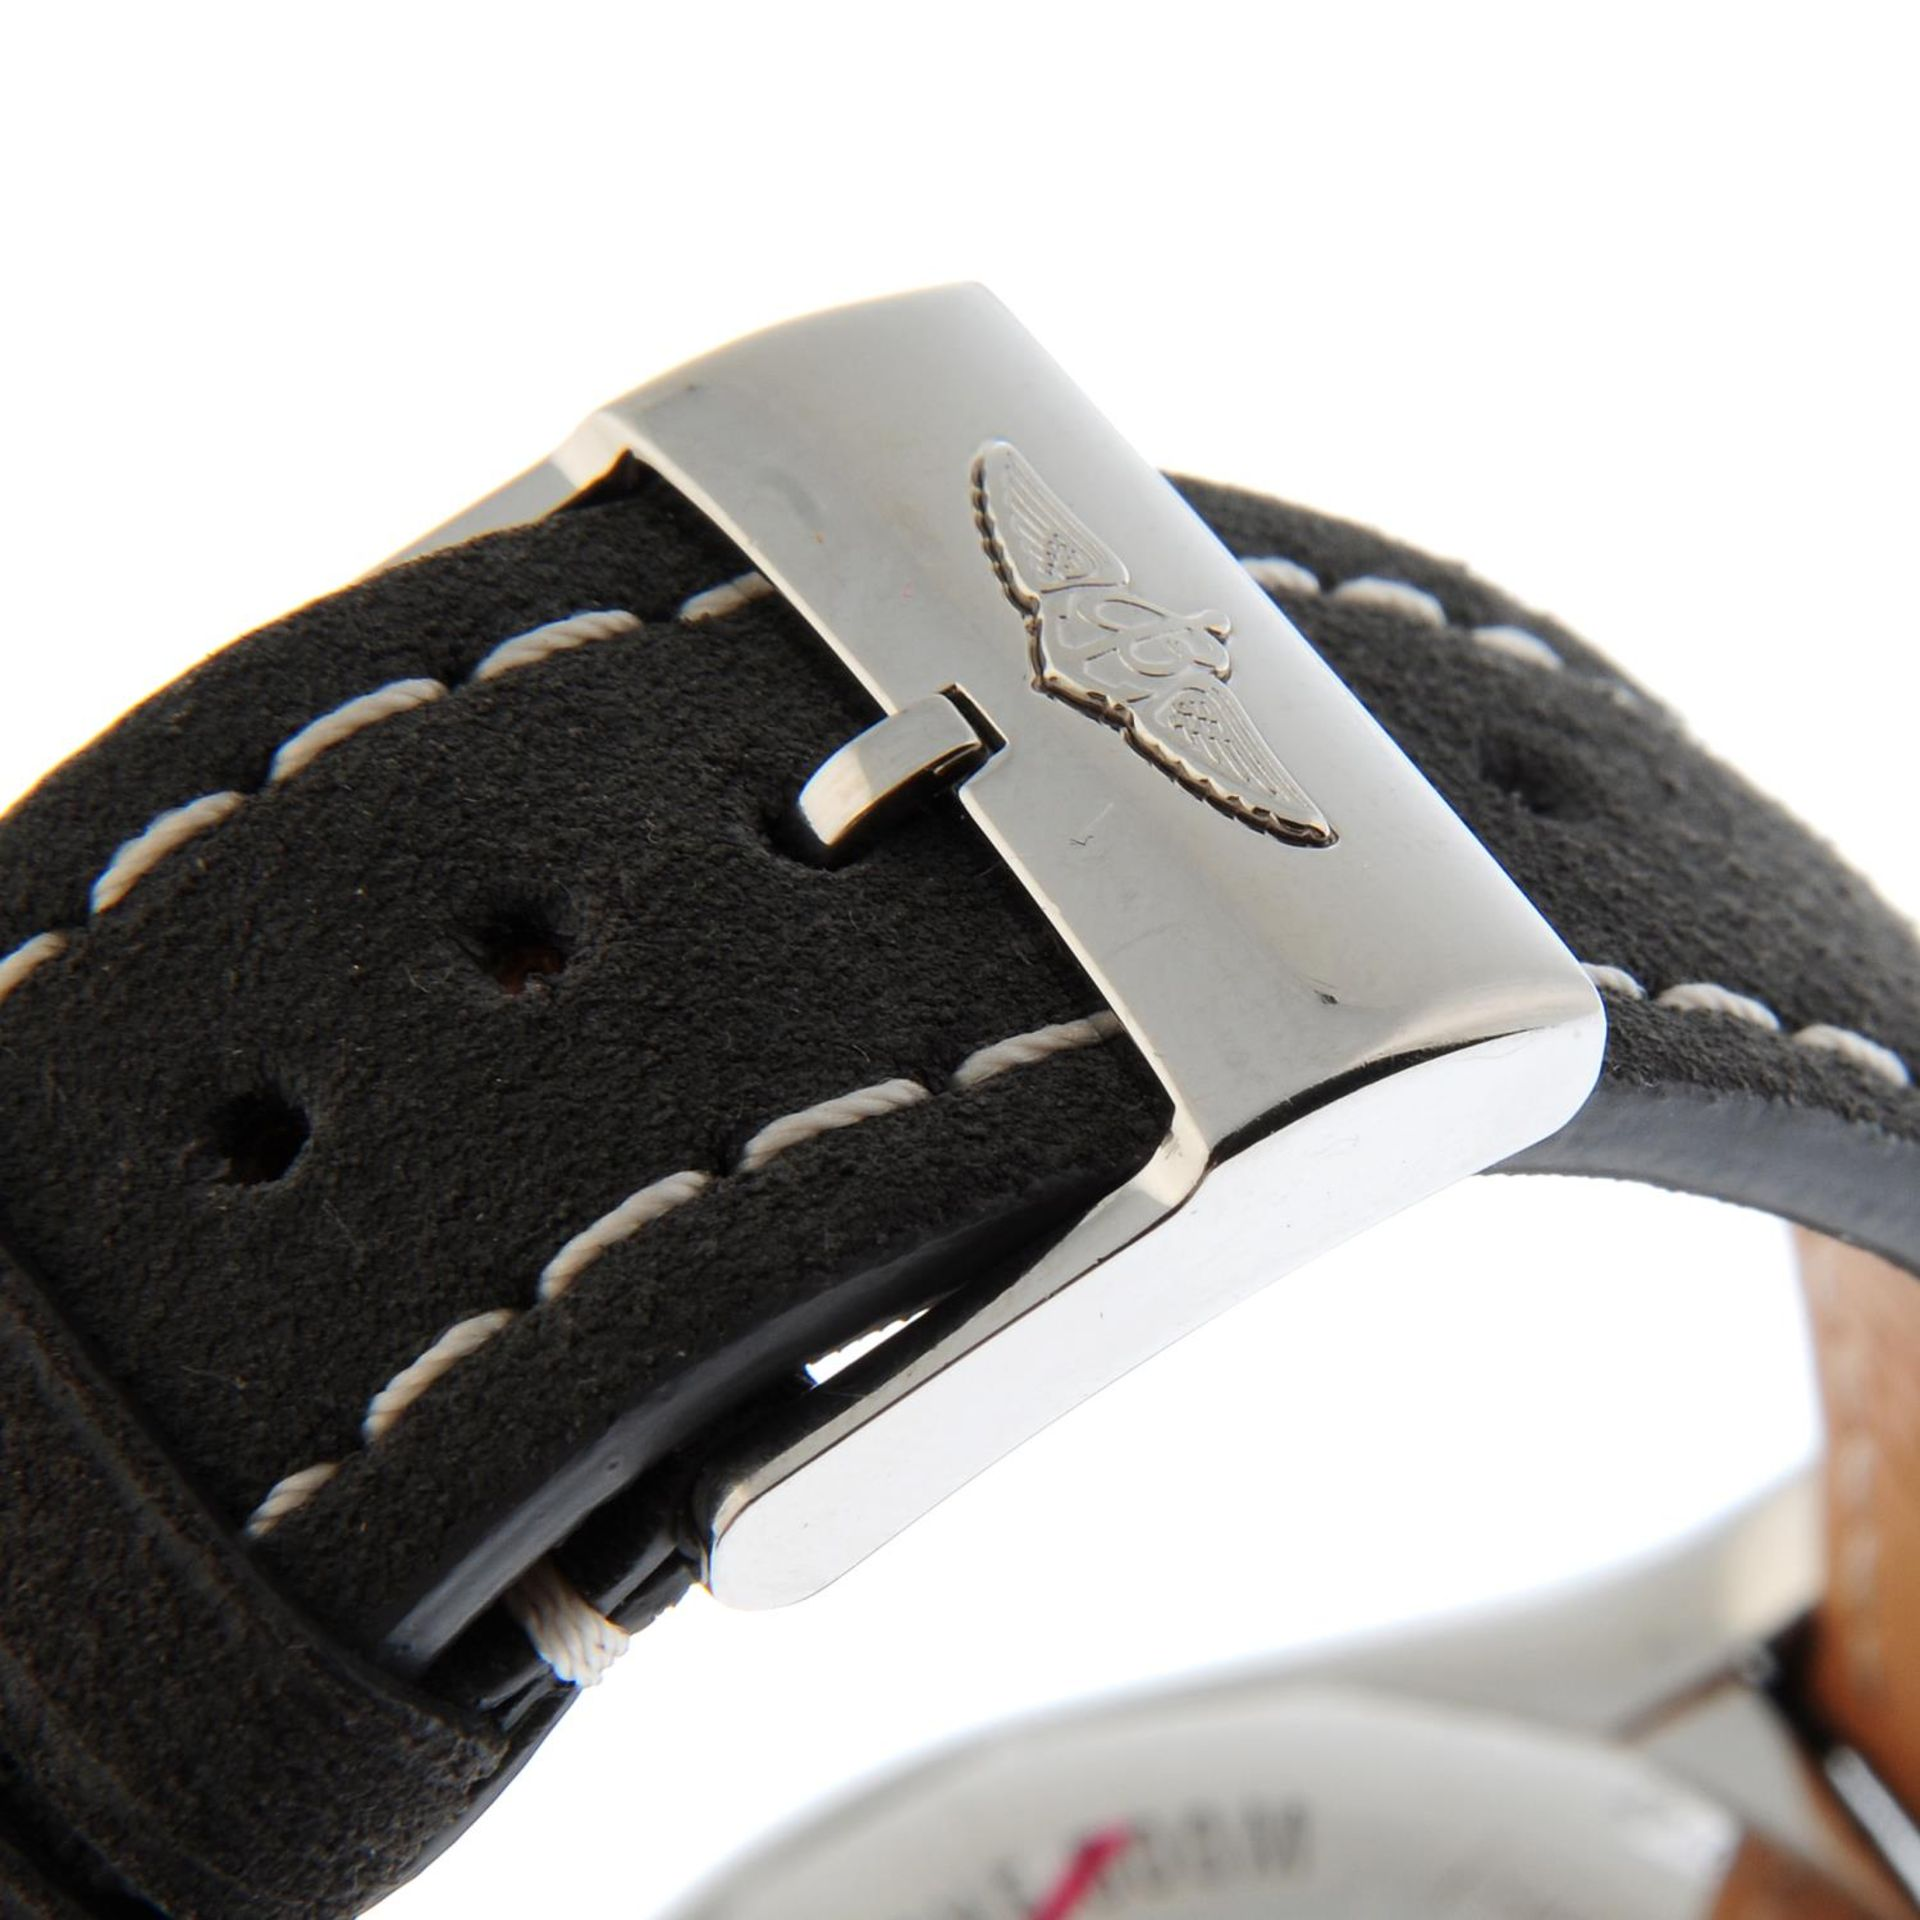 BREITLING - a Chronomat 44 chronograph wrist watch. - Bild 4 aus 5